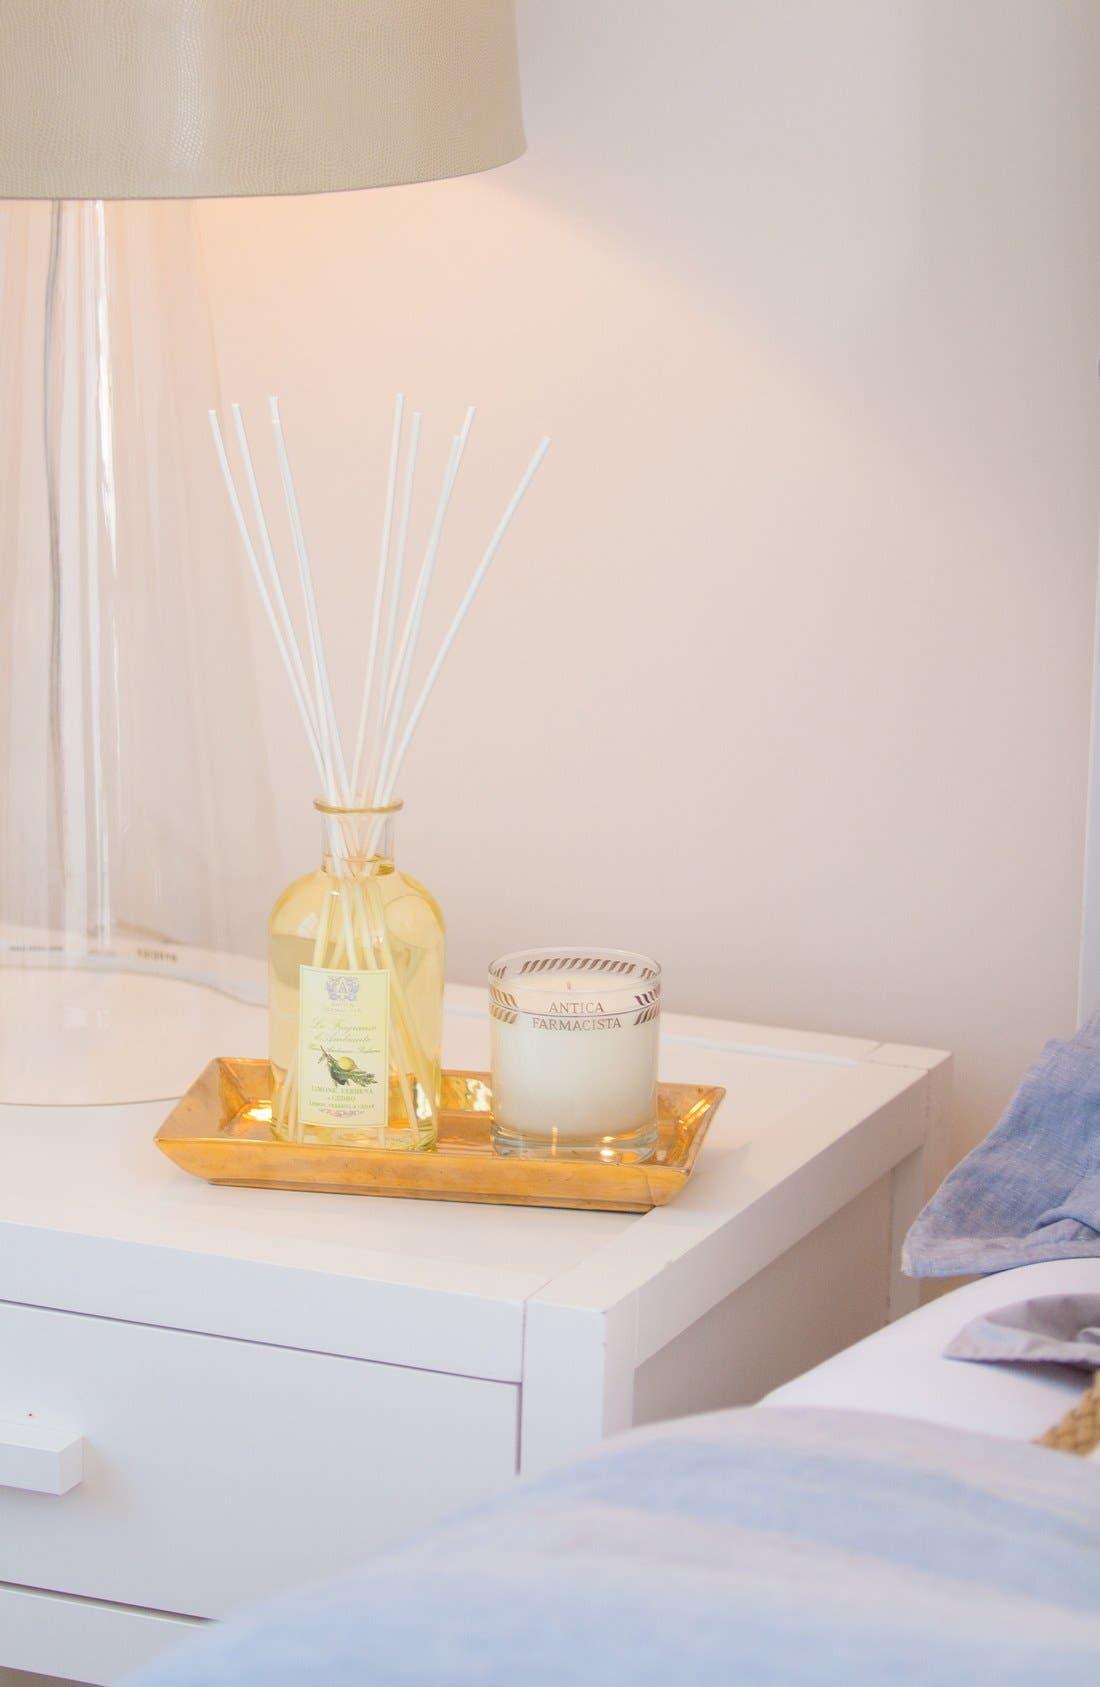 ANTICA FARMACISTA, Lemon, Verbena & Cedar Home Ambiance Perfume, Alternate thumbnail 2, color, NO COLOR